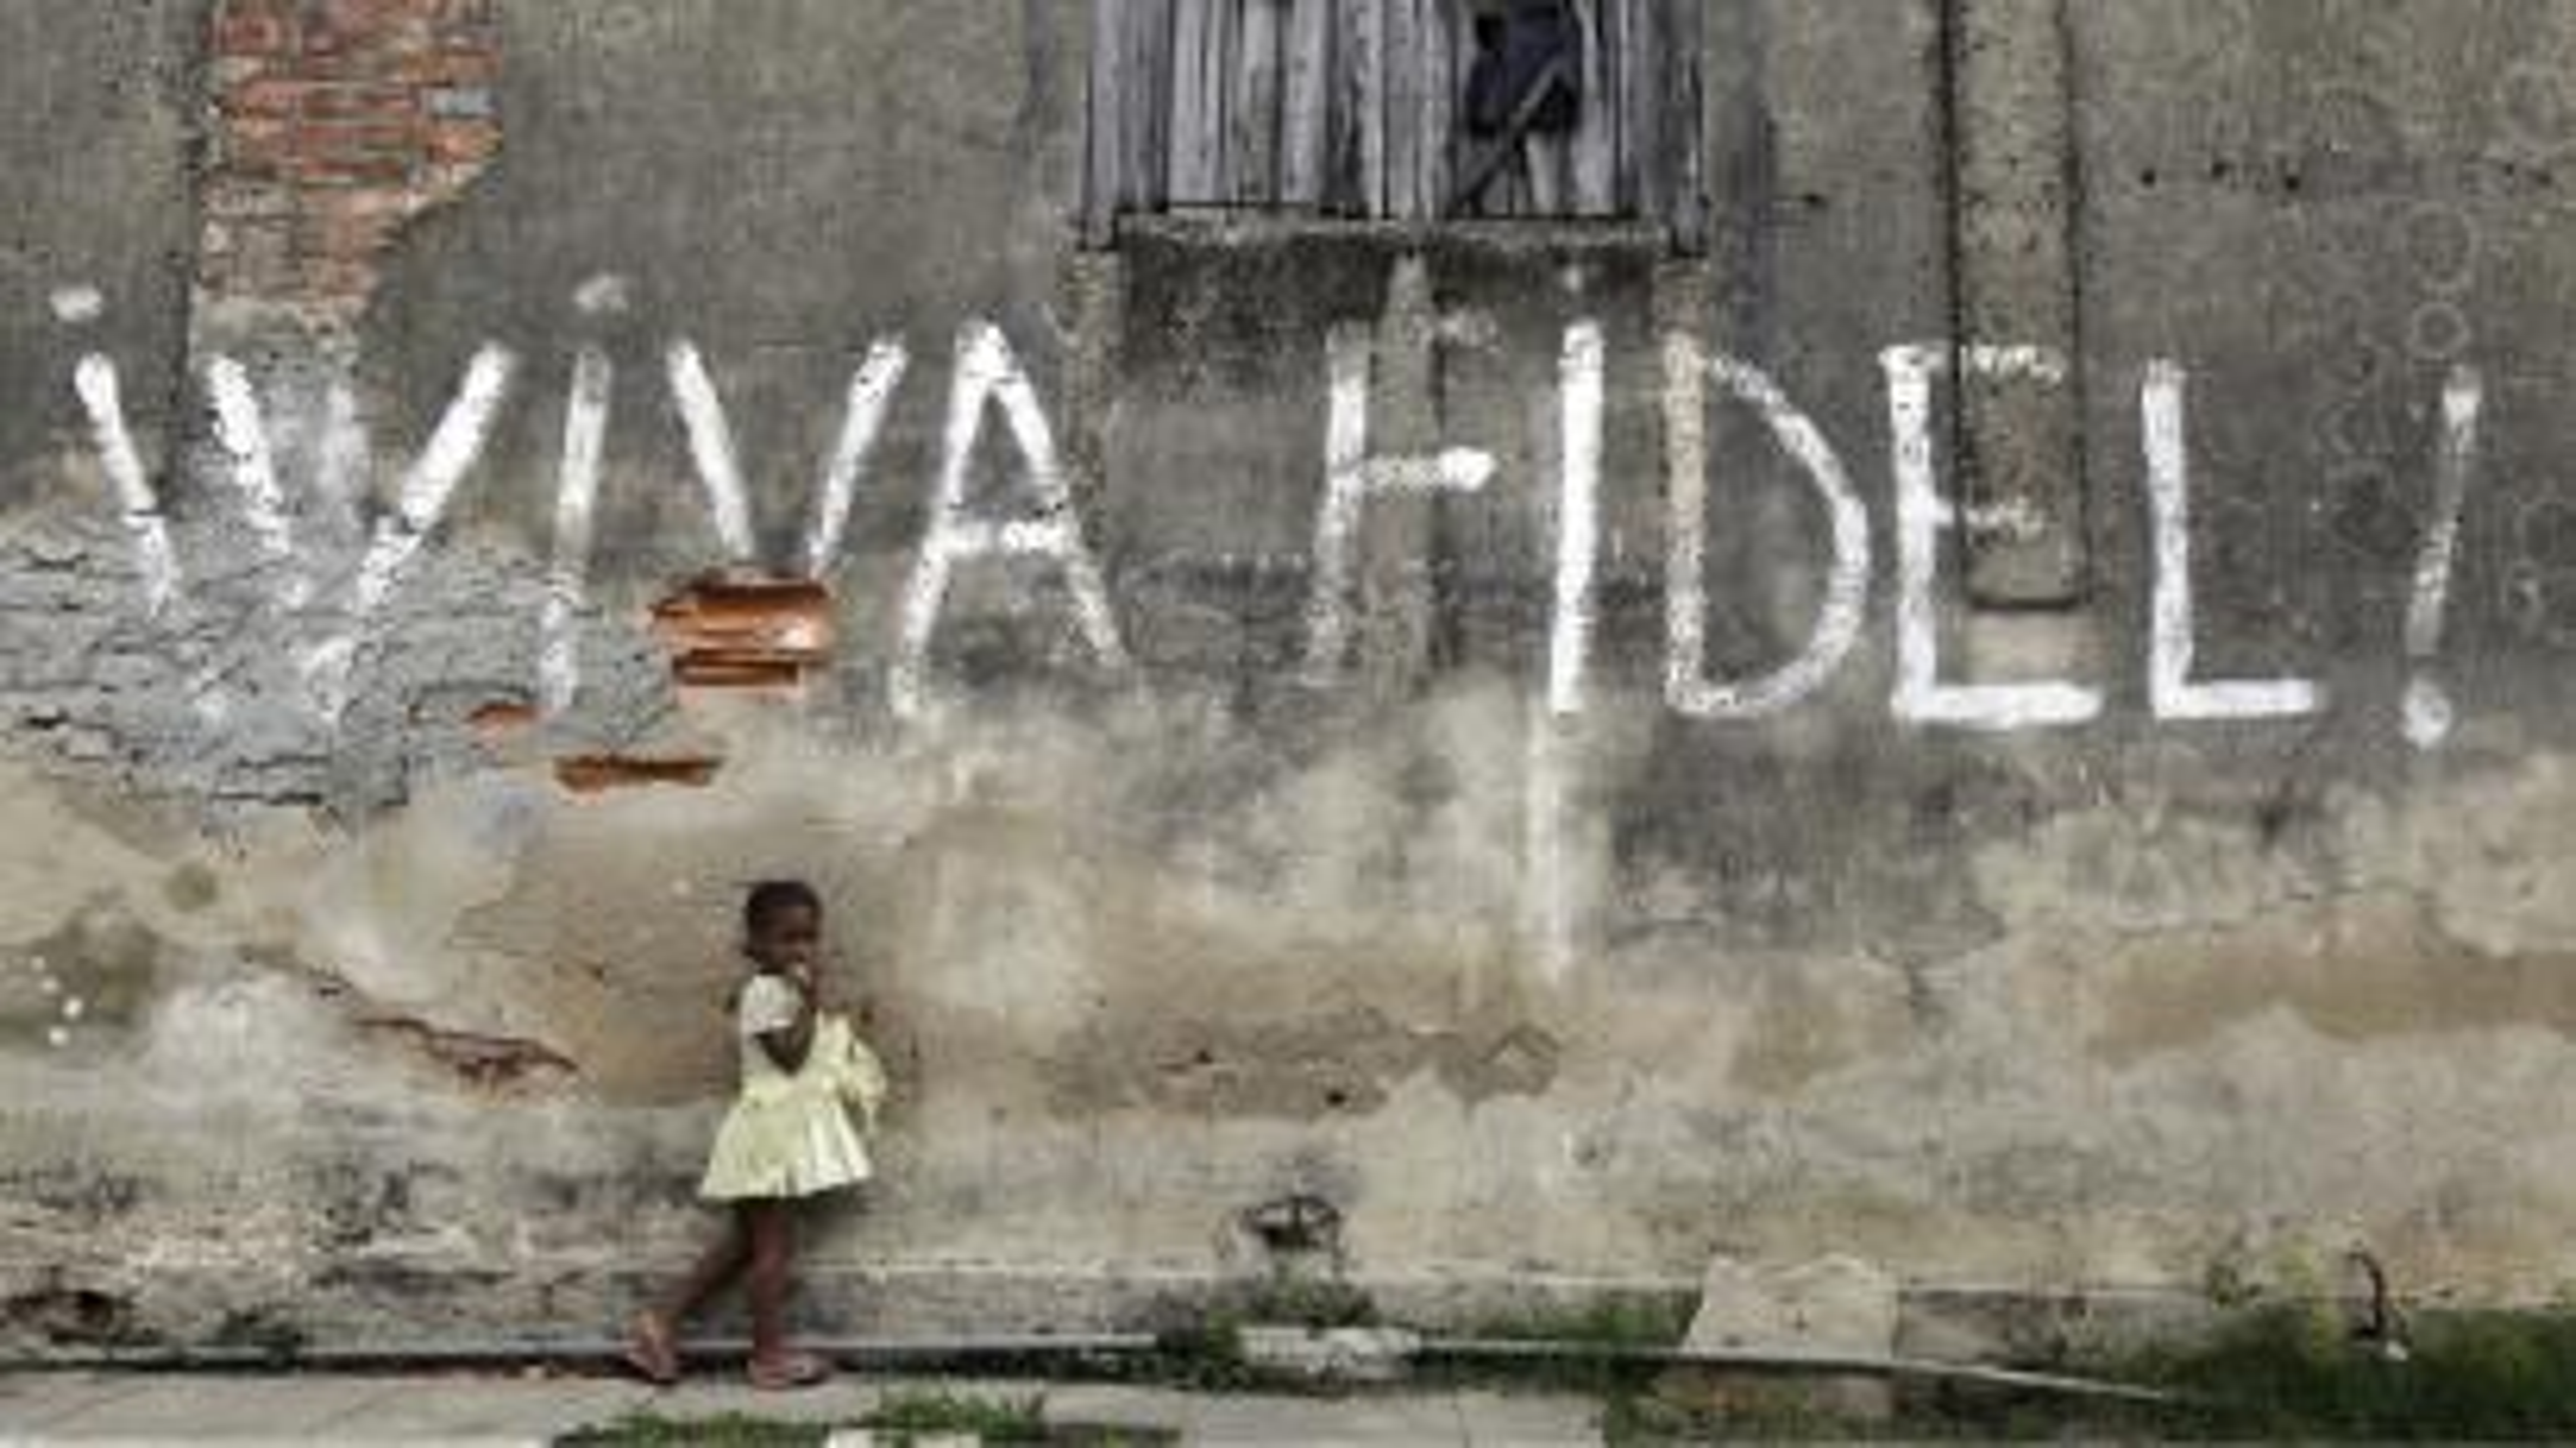 viva fidel graffiti